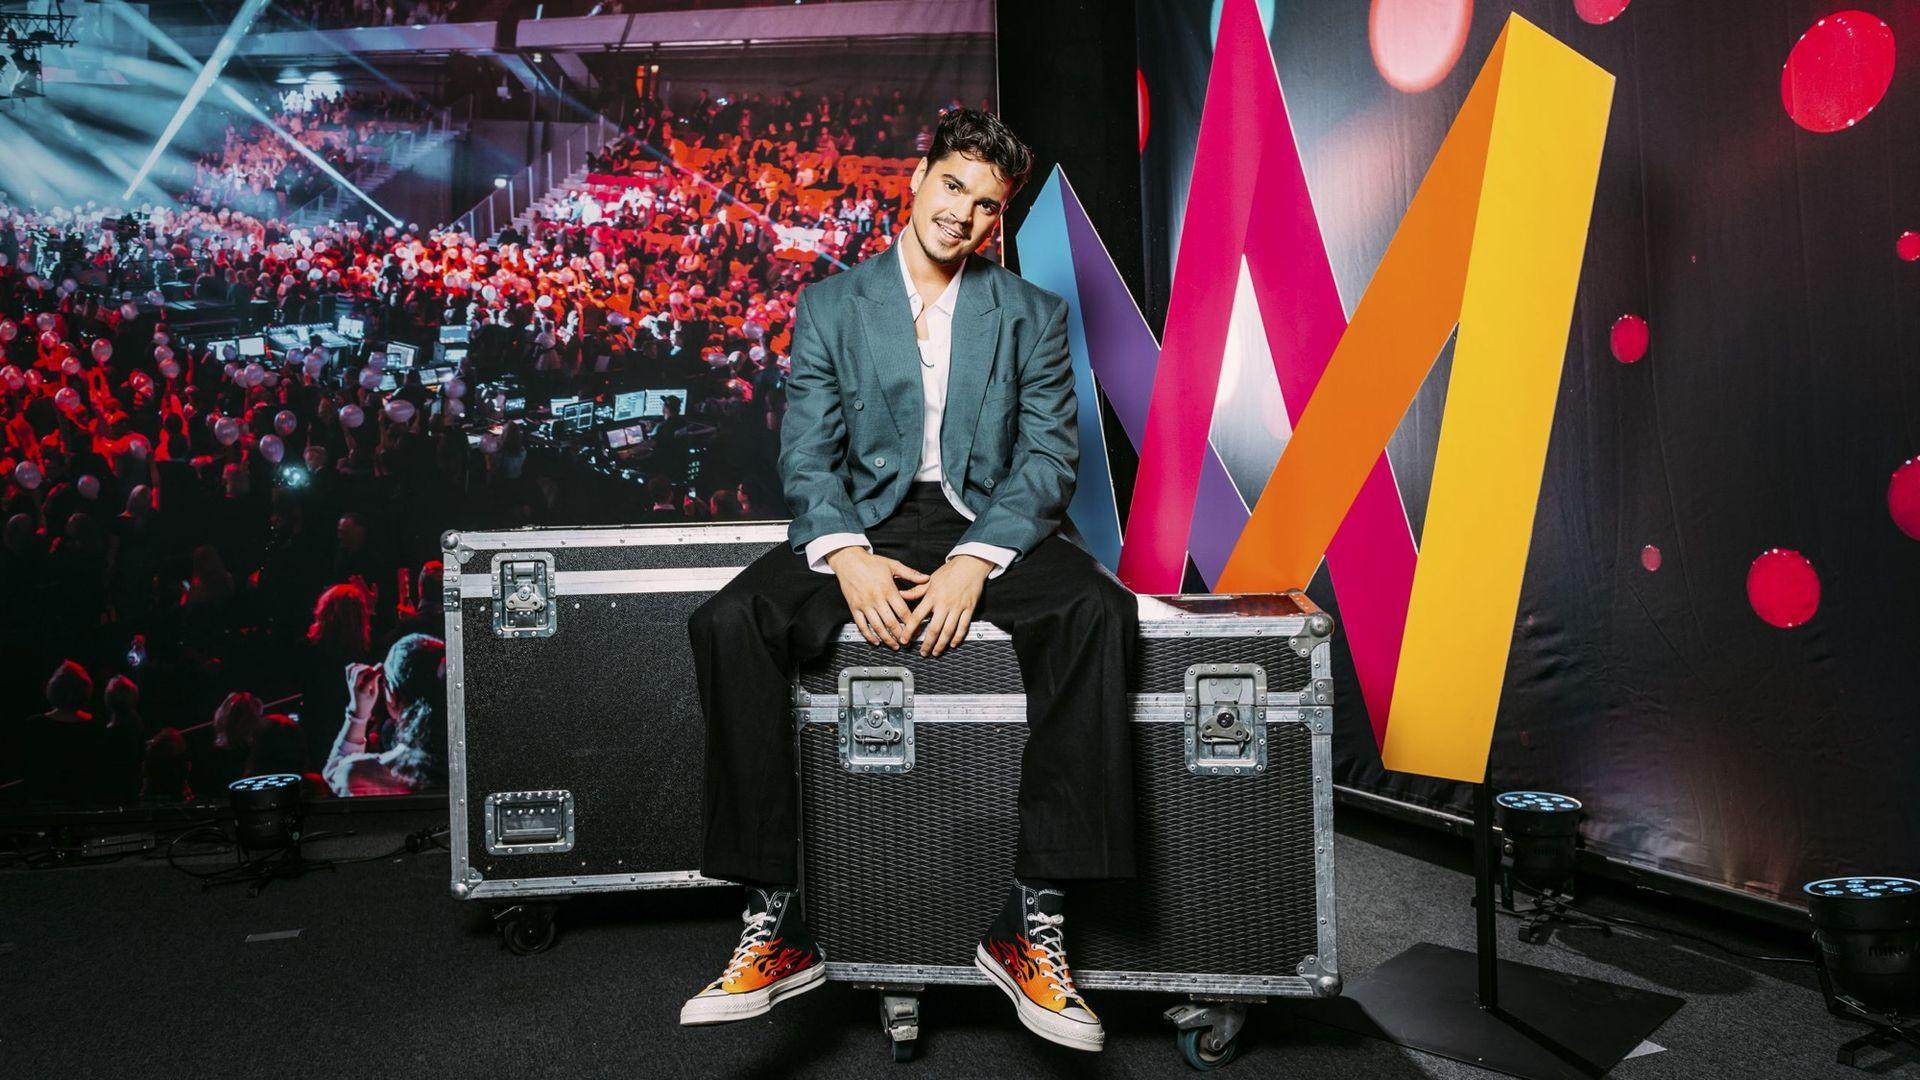 Oscar Zia leder Melodifestivalen nästa år